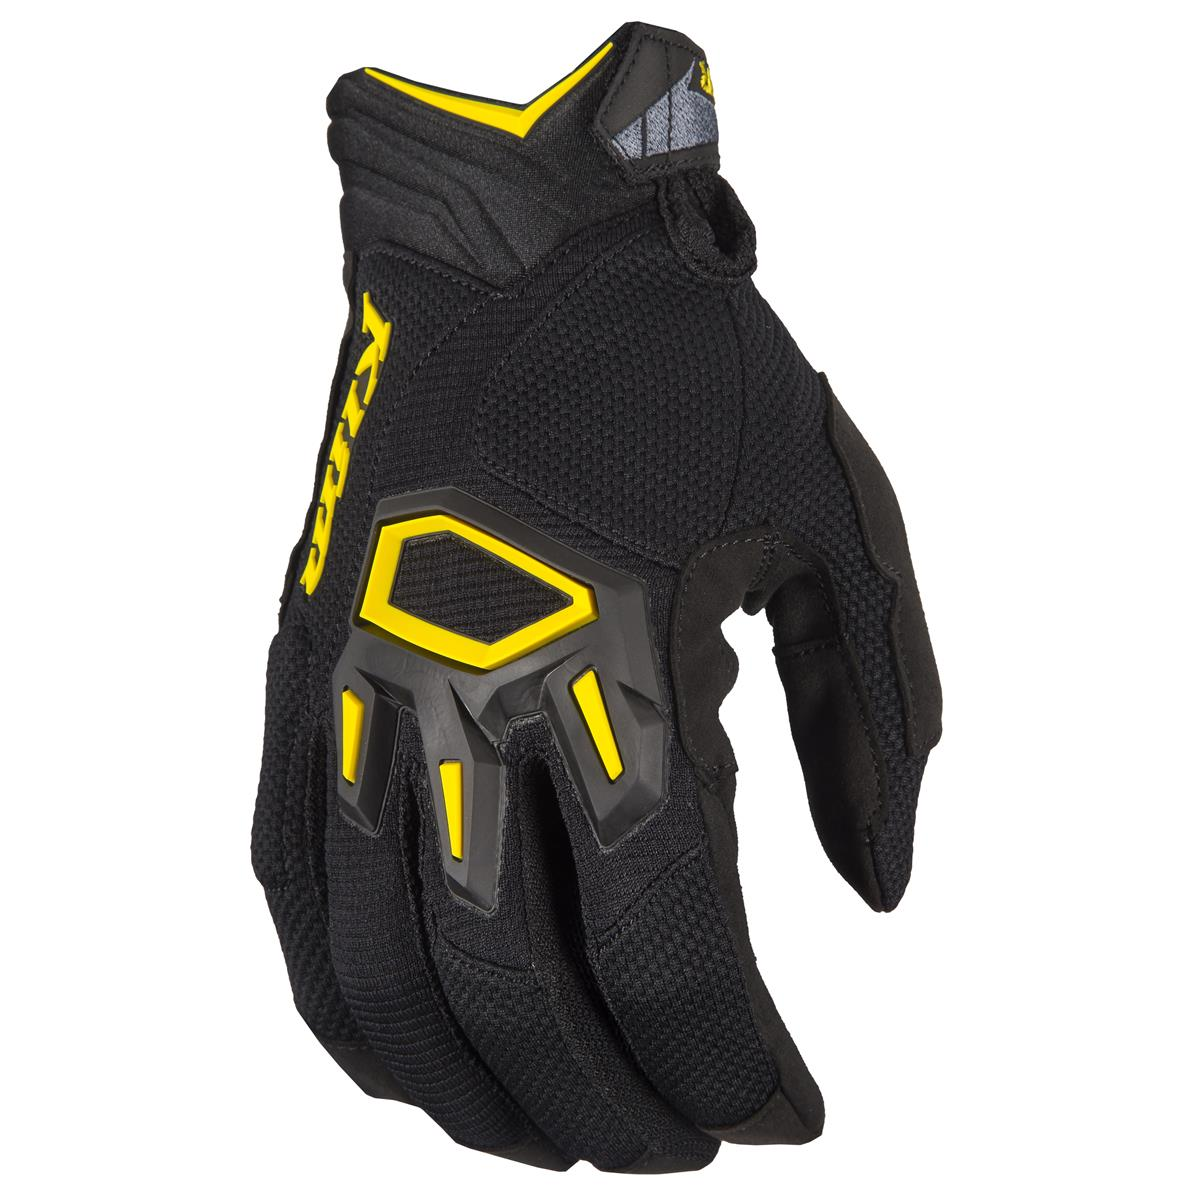 Klim Handschuhe Dakar Schwarz